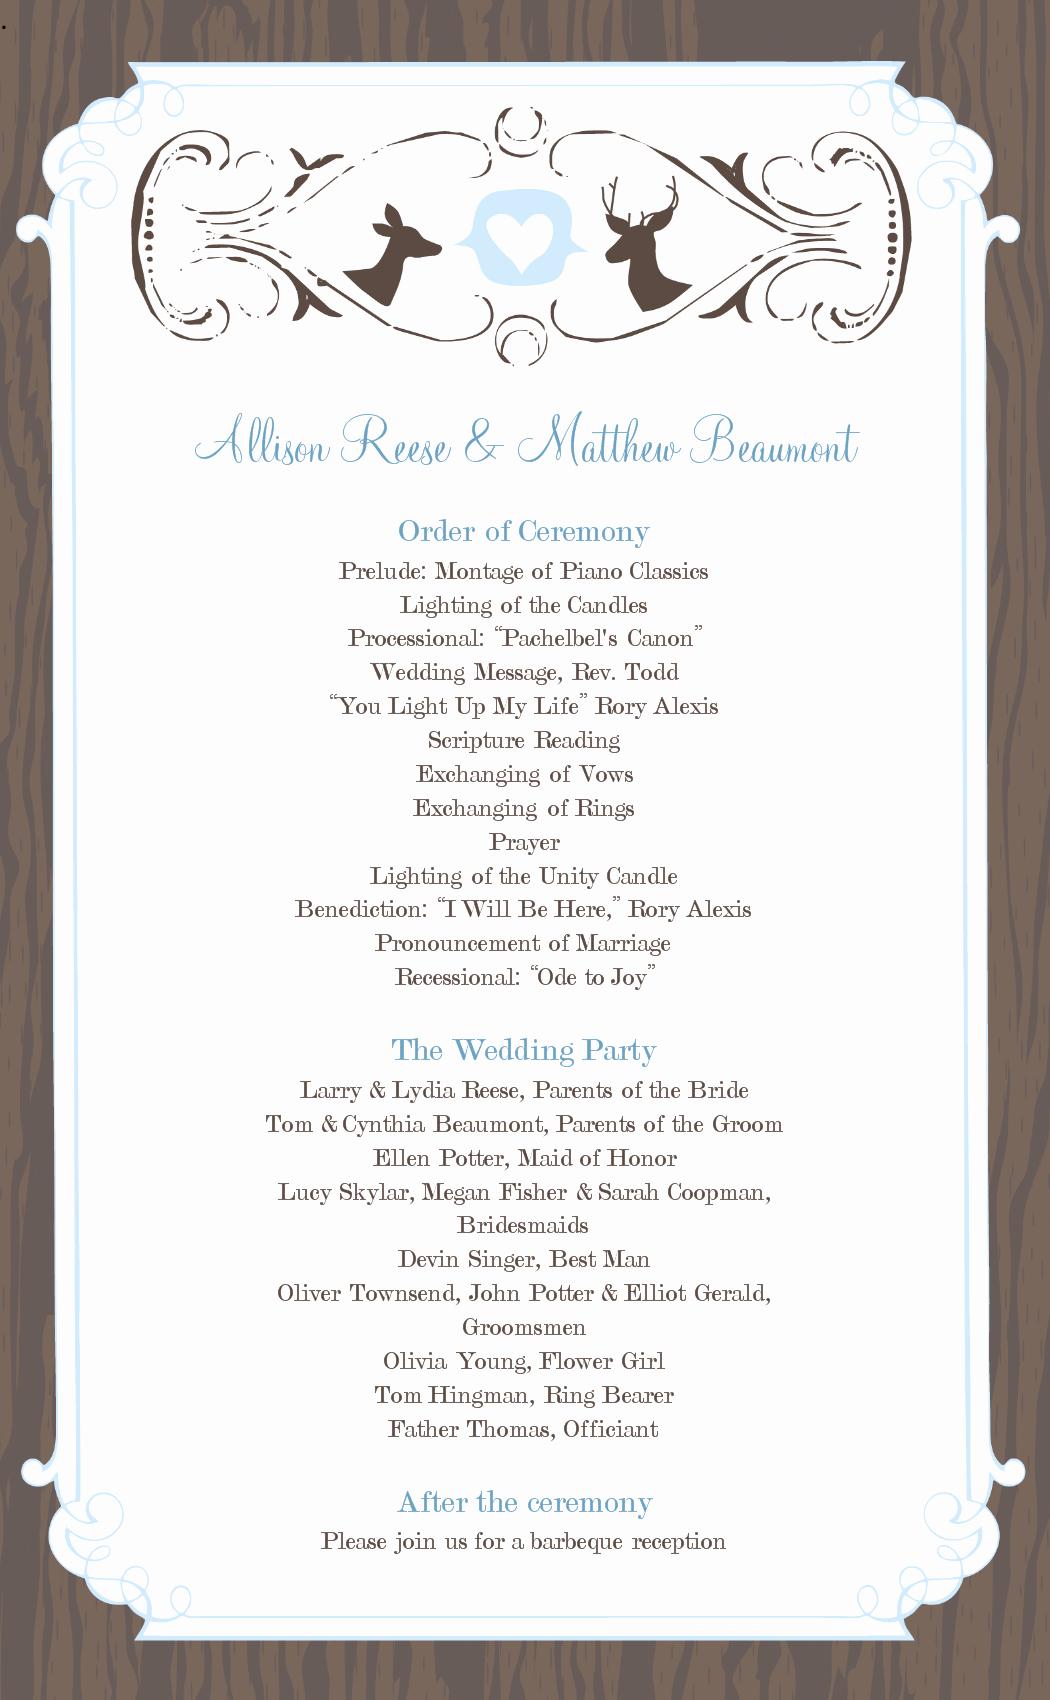 Reception Program Template Awesome Wedding Program Templates Free